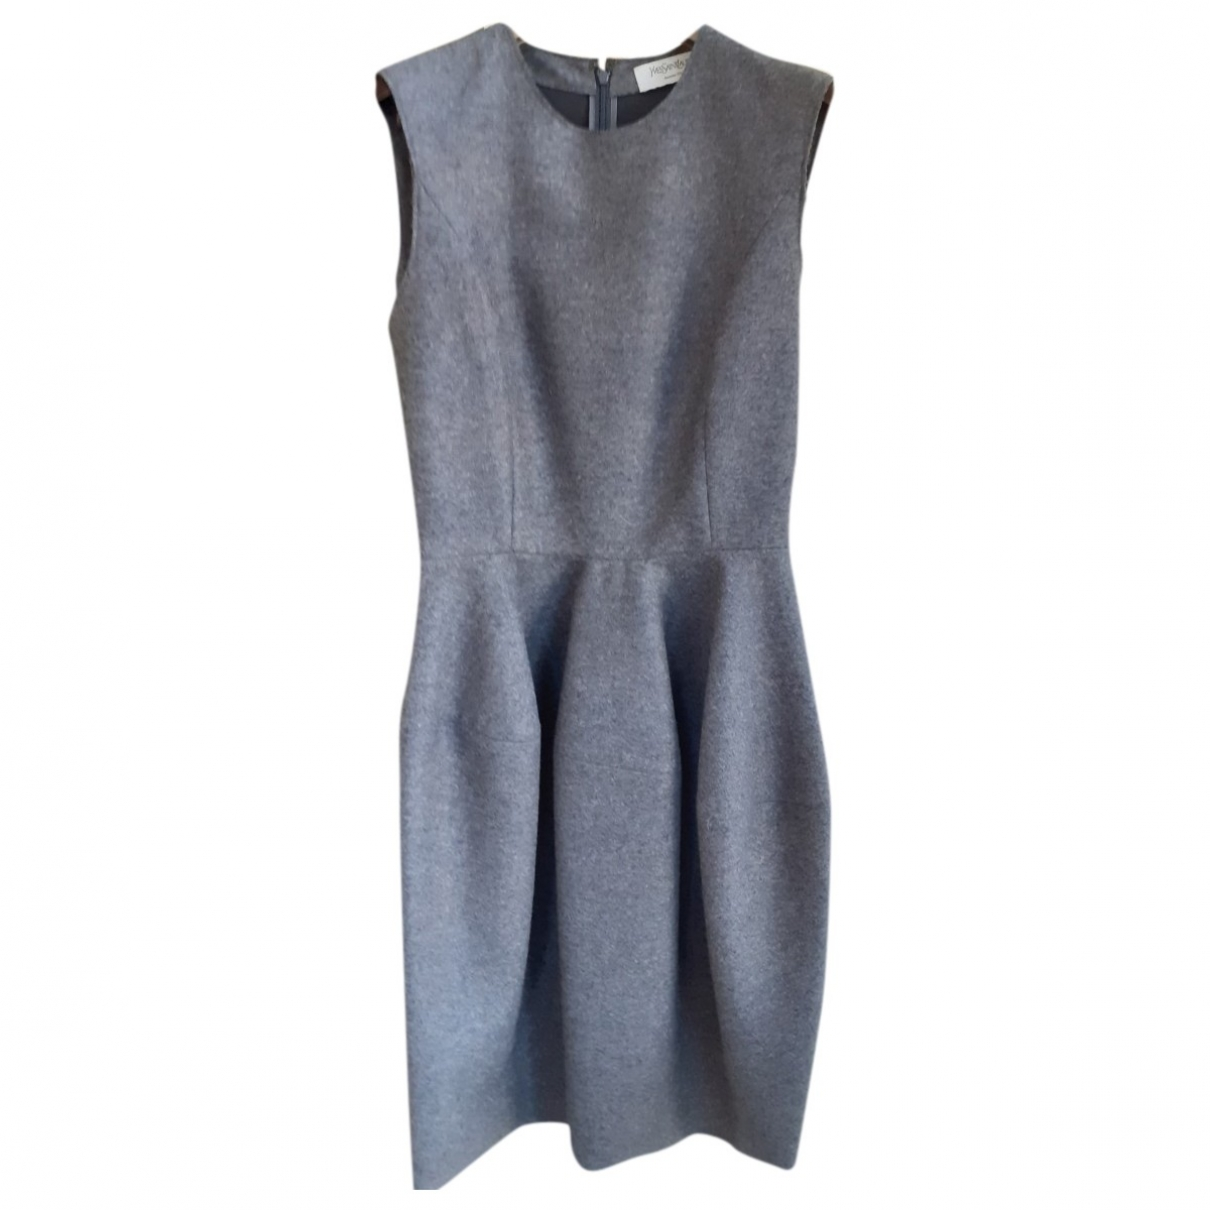 Yves Saint Laurent \N Kleid in  Anthrazit Wolle